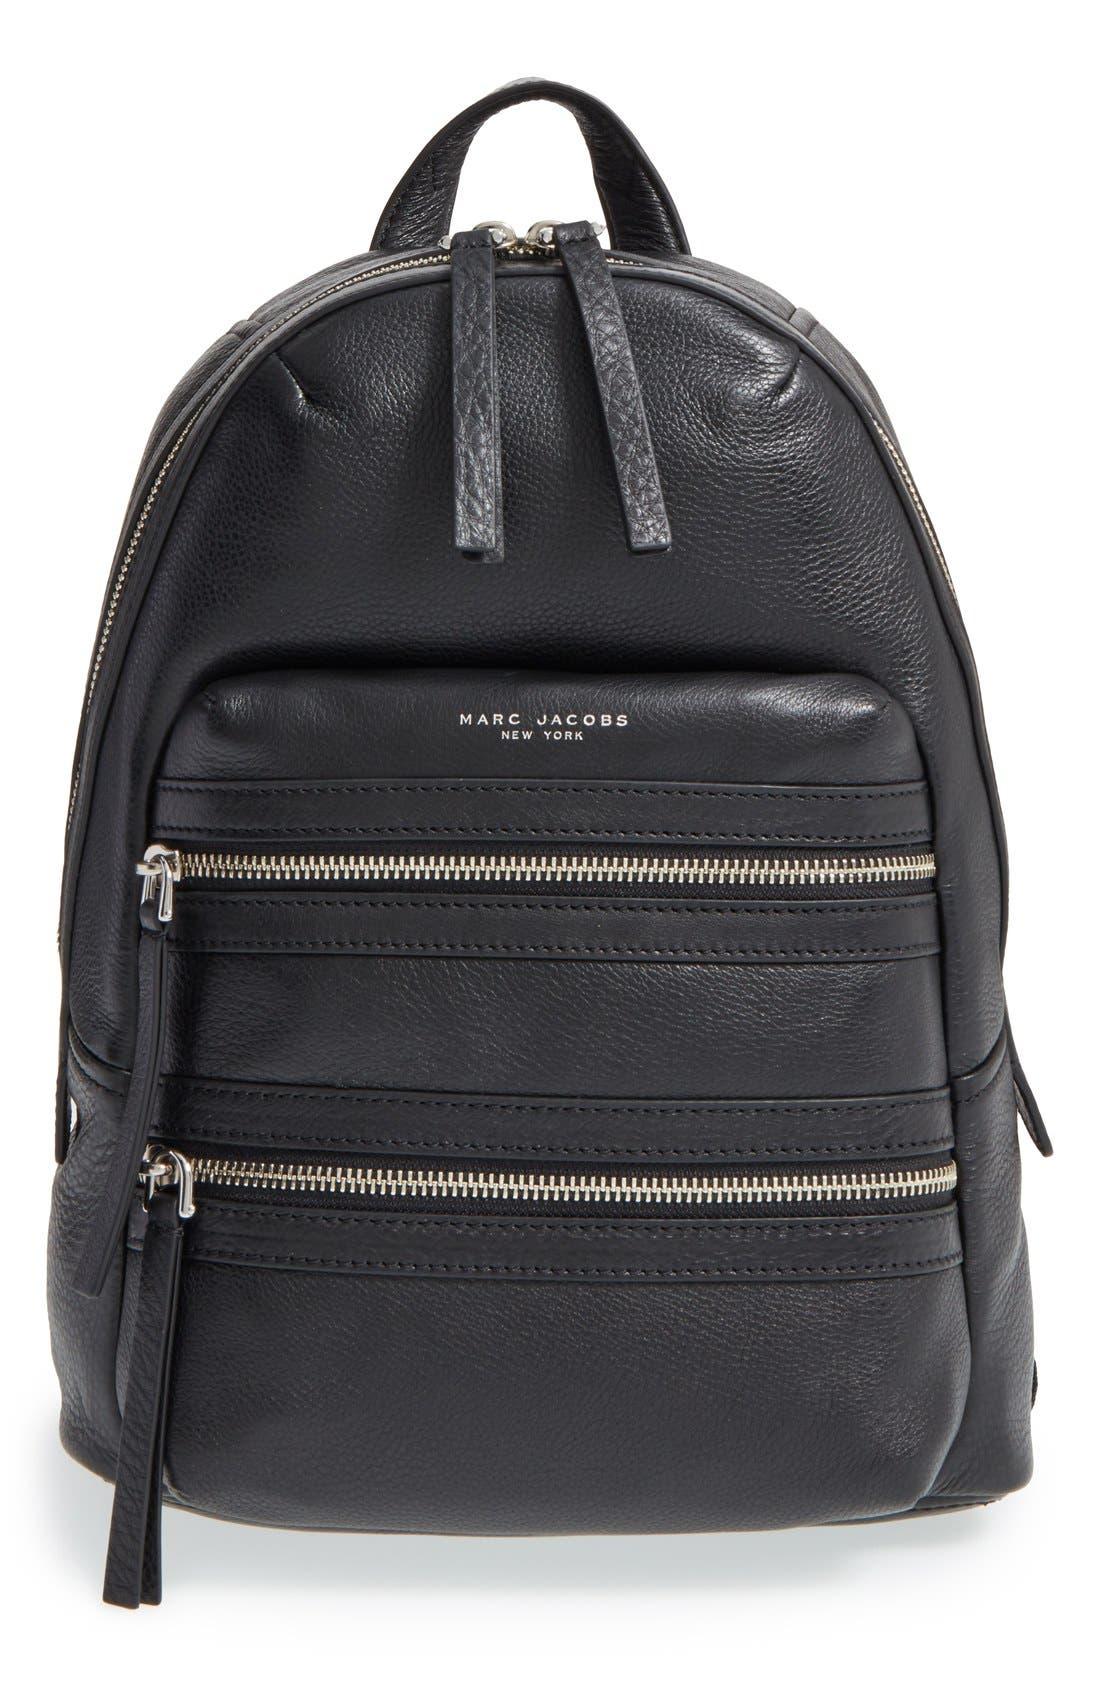 Alternate Image 1 Selected - MARC JACOBS 'Biker' Leather Backpack